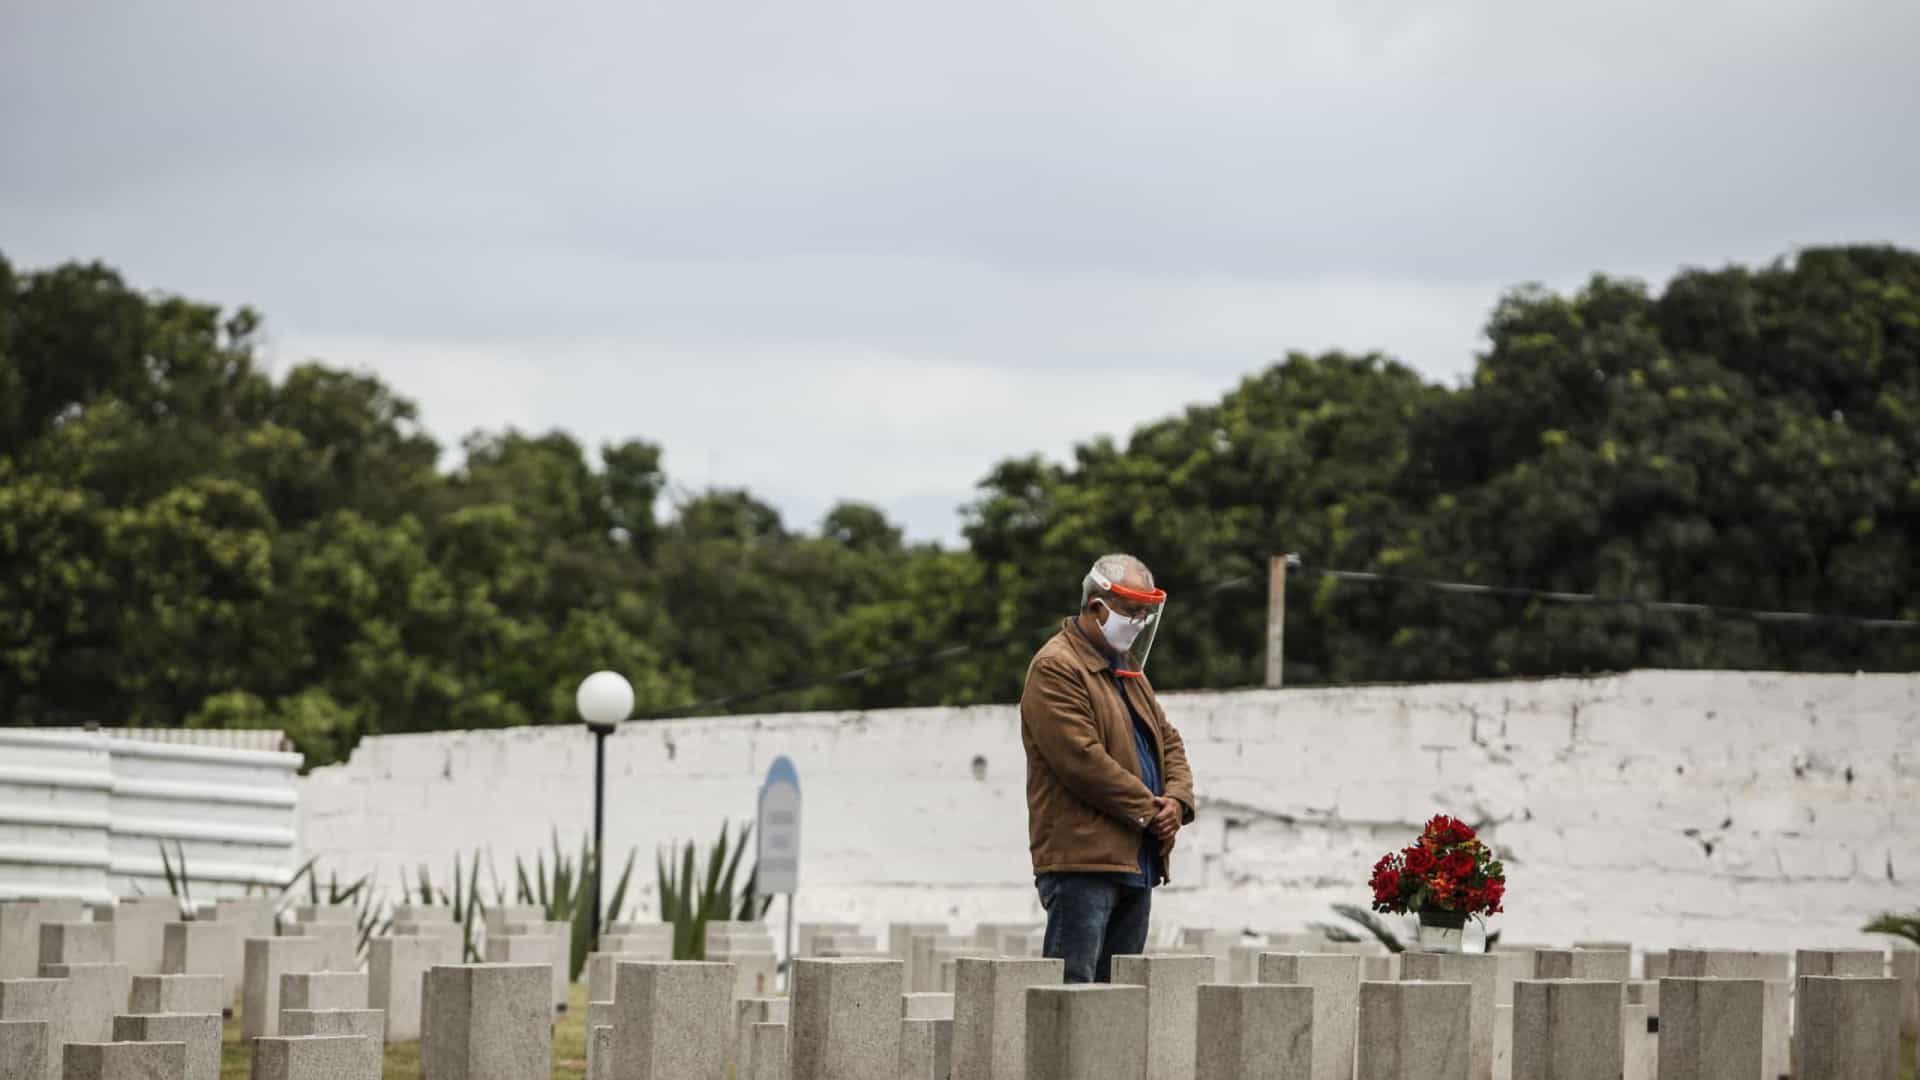 Brasil ultrapassa 190,5 mil mortes pela Covid-19, mostra consórcio de imprensa